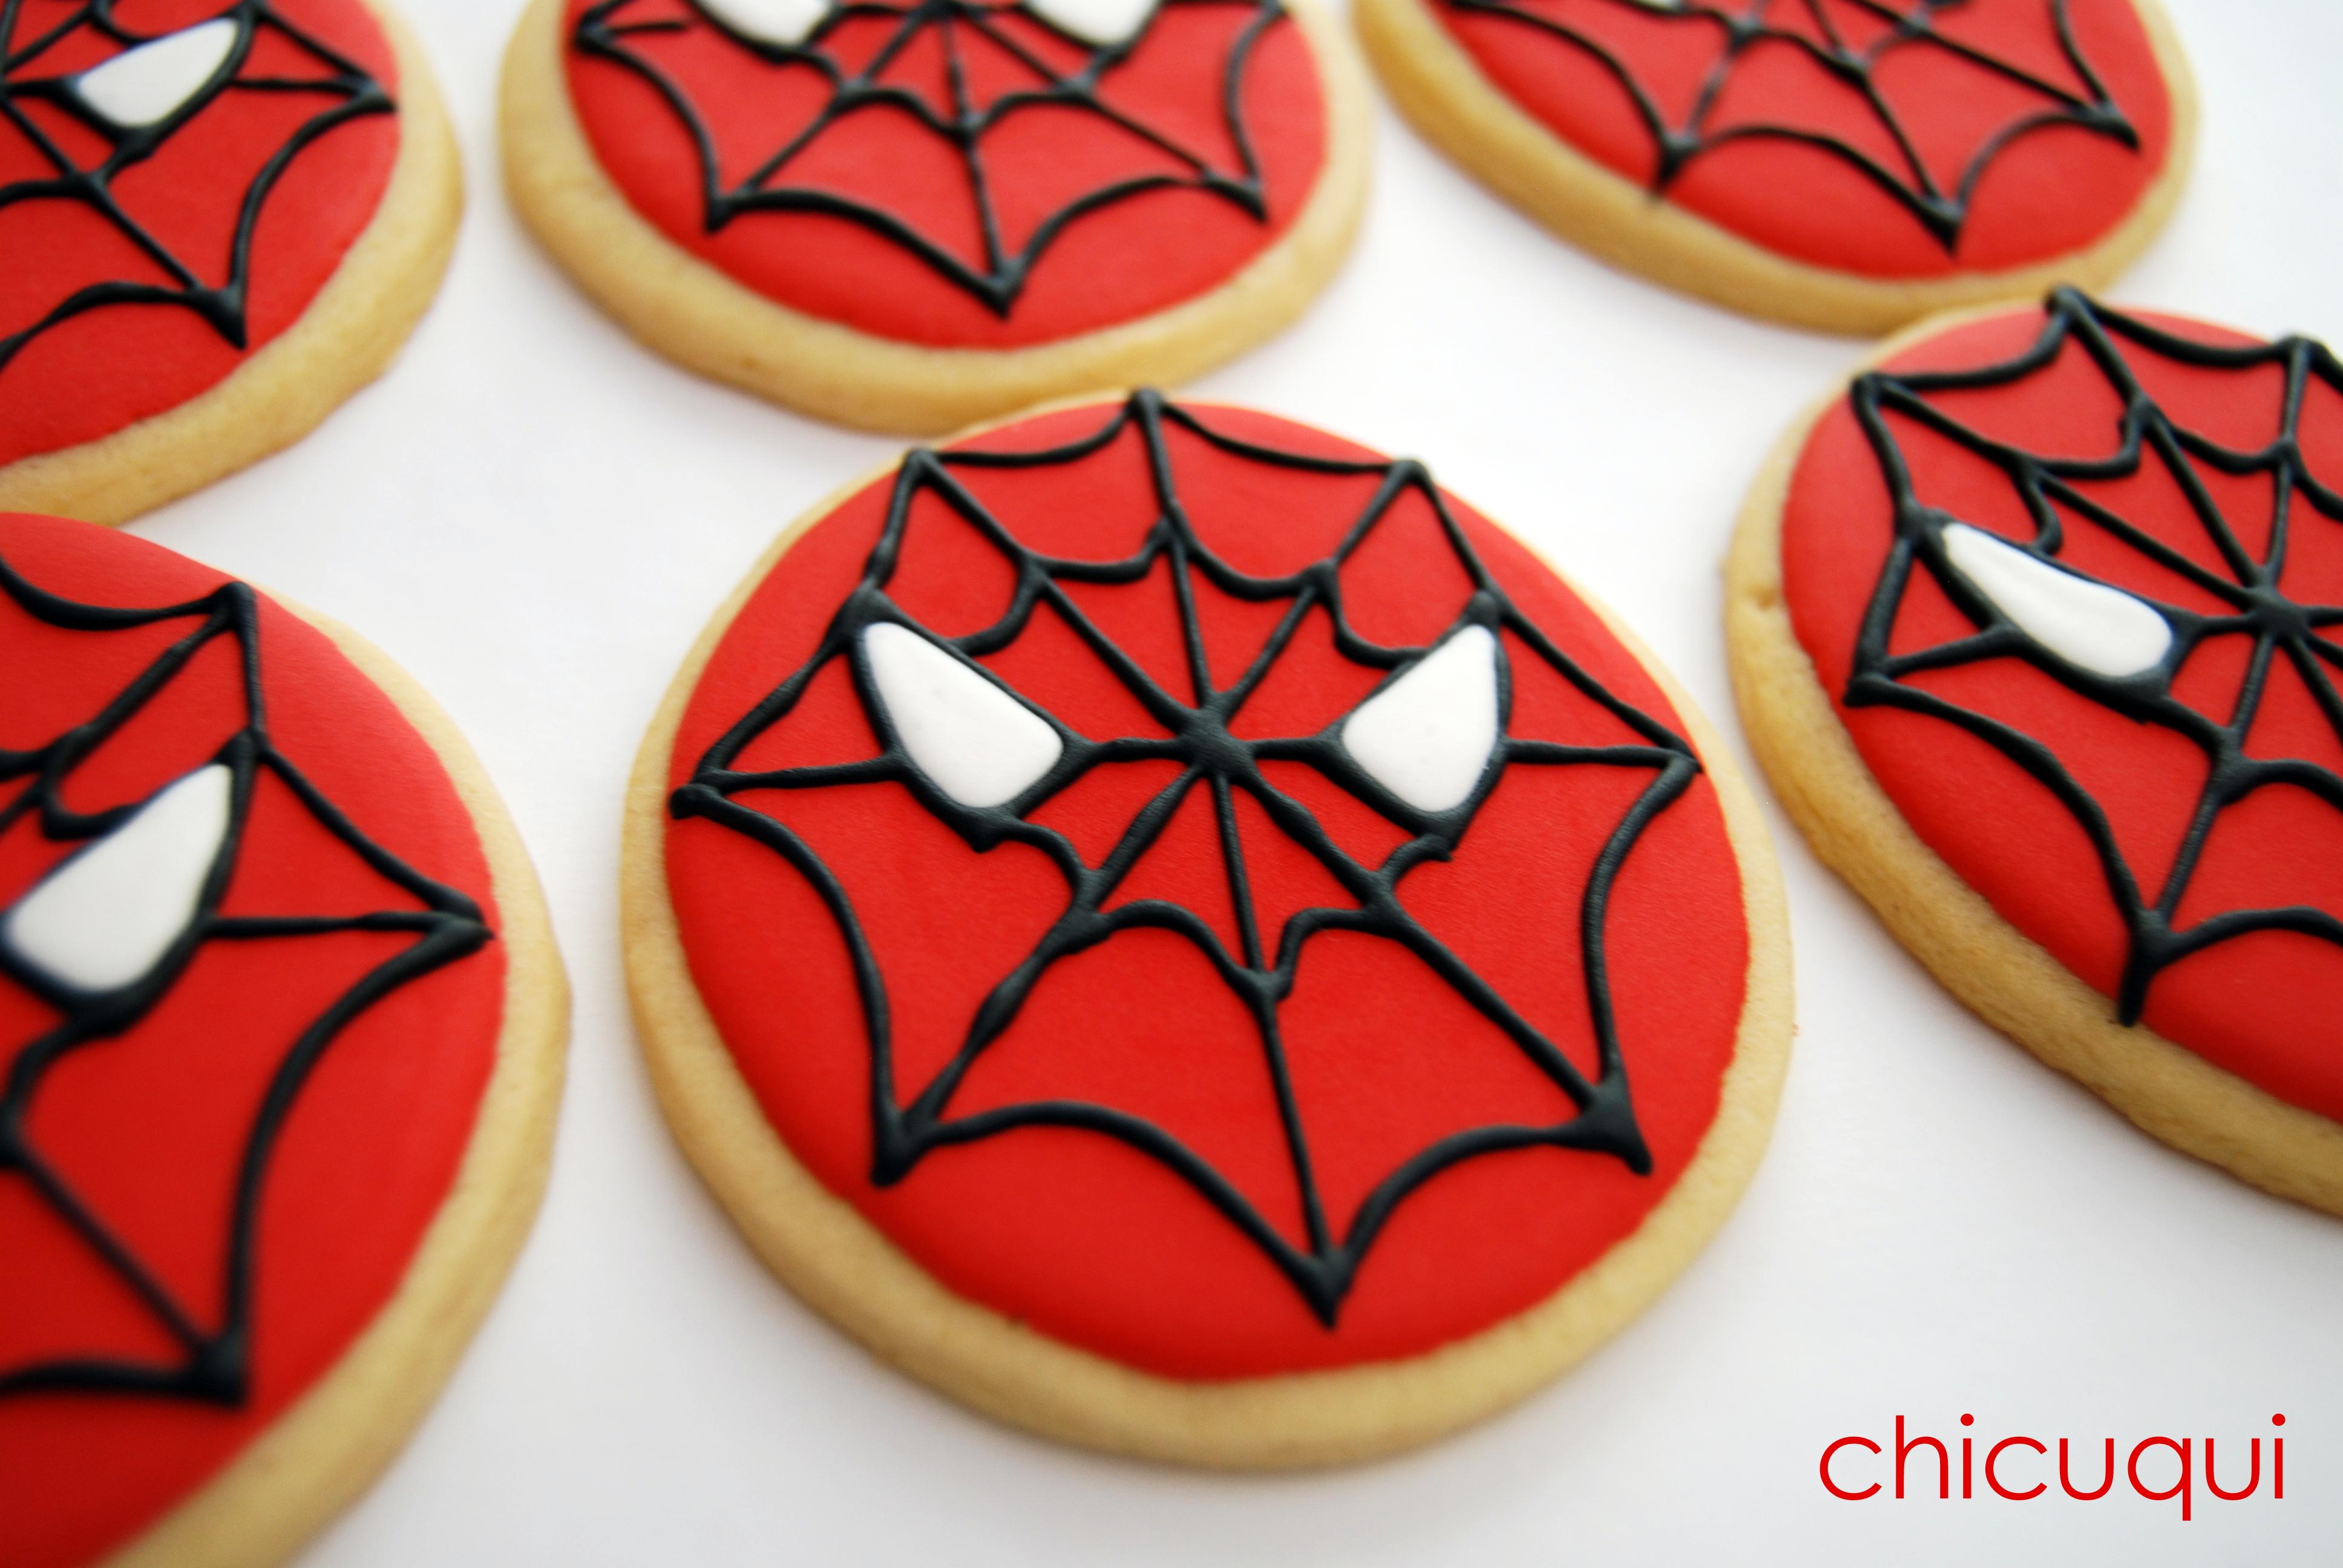 Spiderman La Galleta Decorada Chicuqui